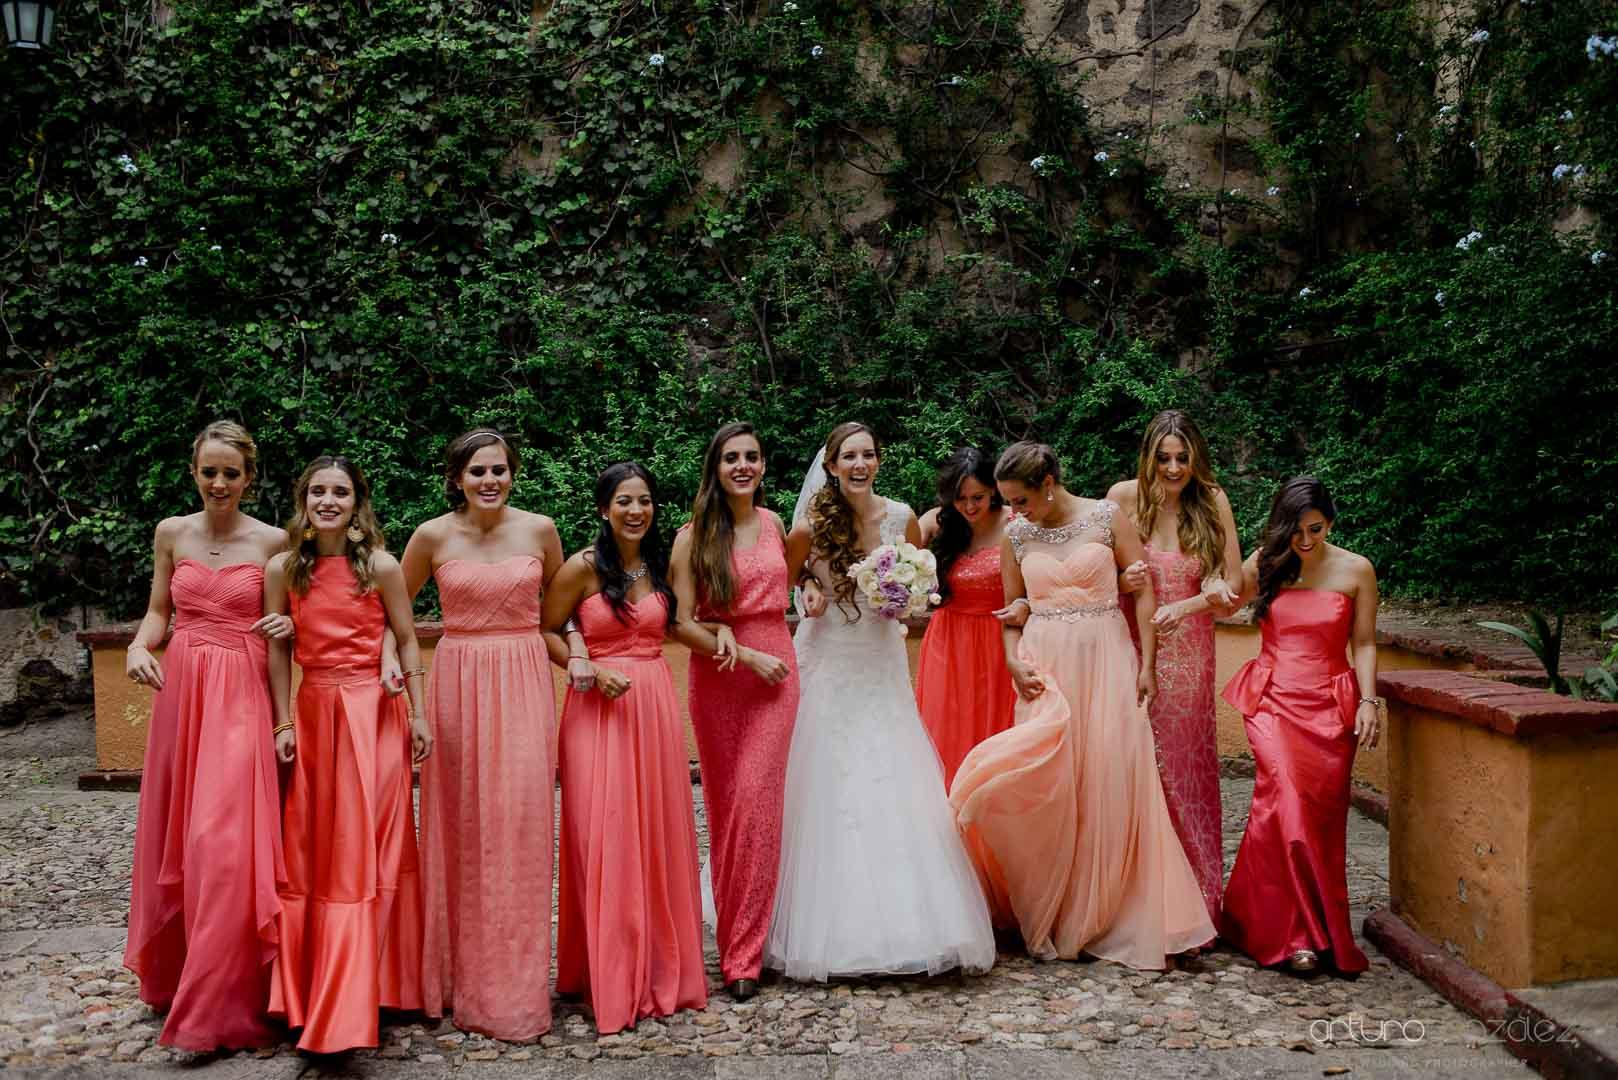 fotografo-de-bodas-en-guanajuato-45